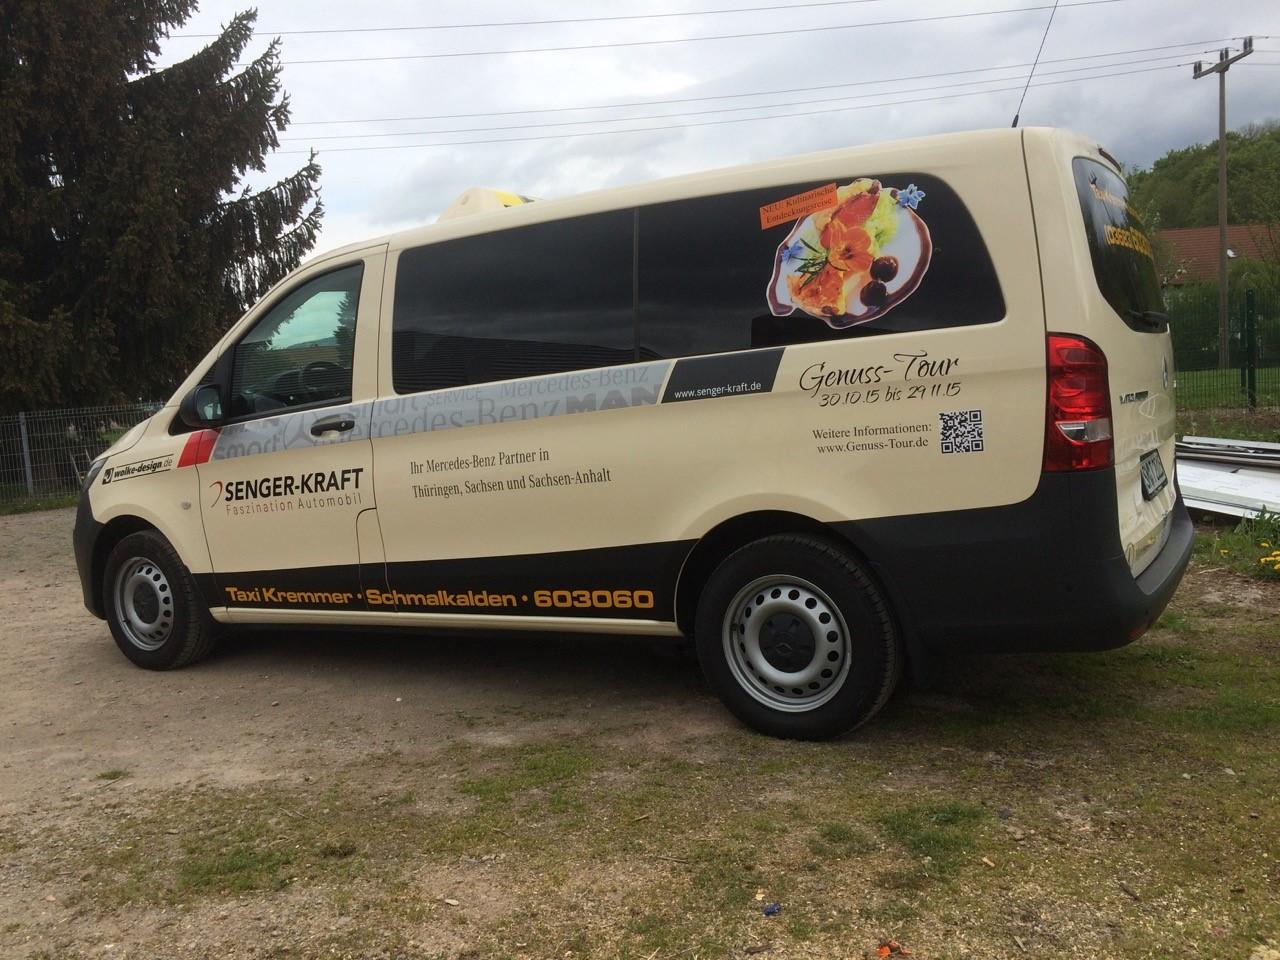 Taxi Kremmer